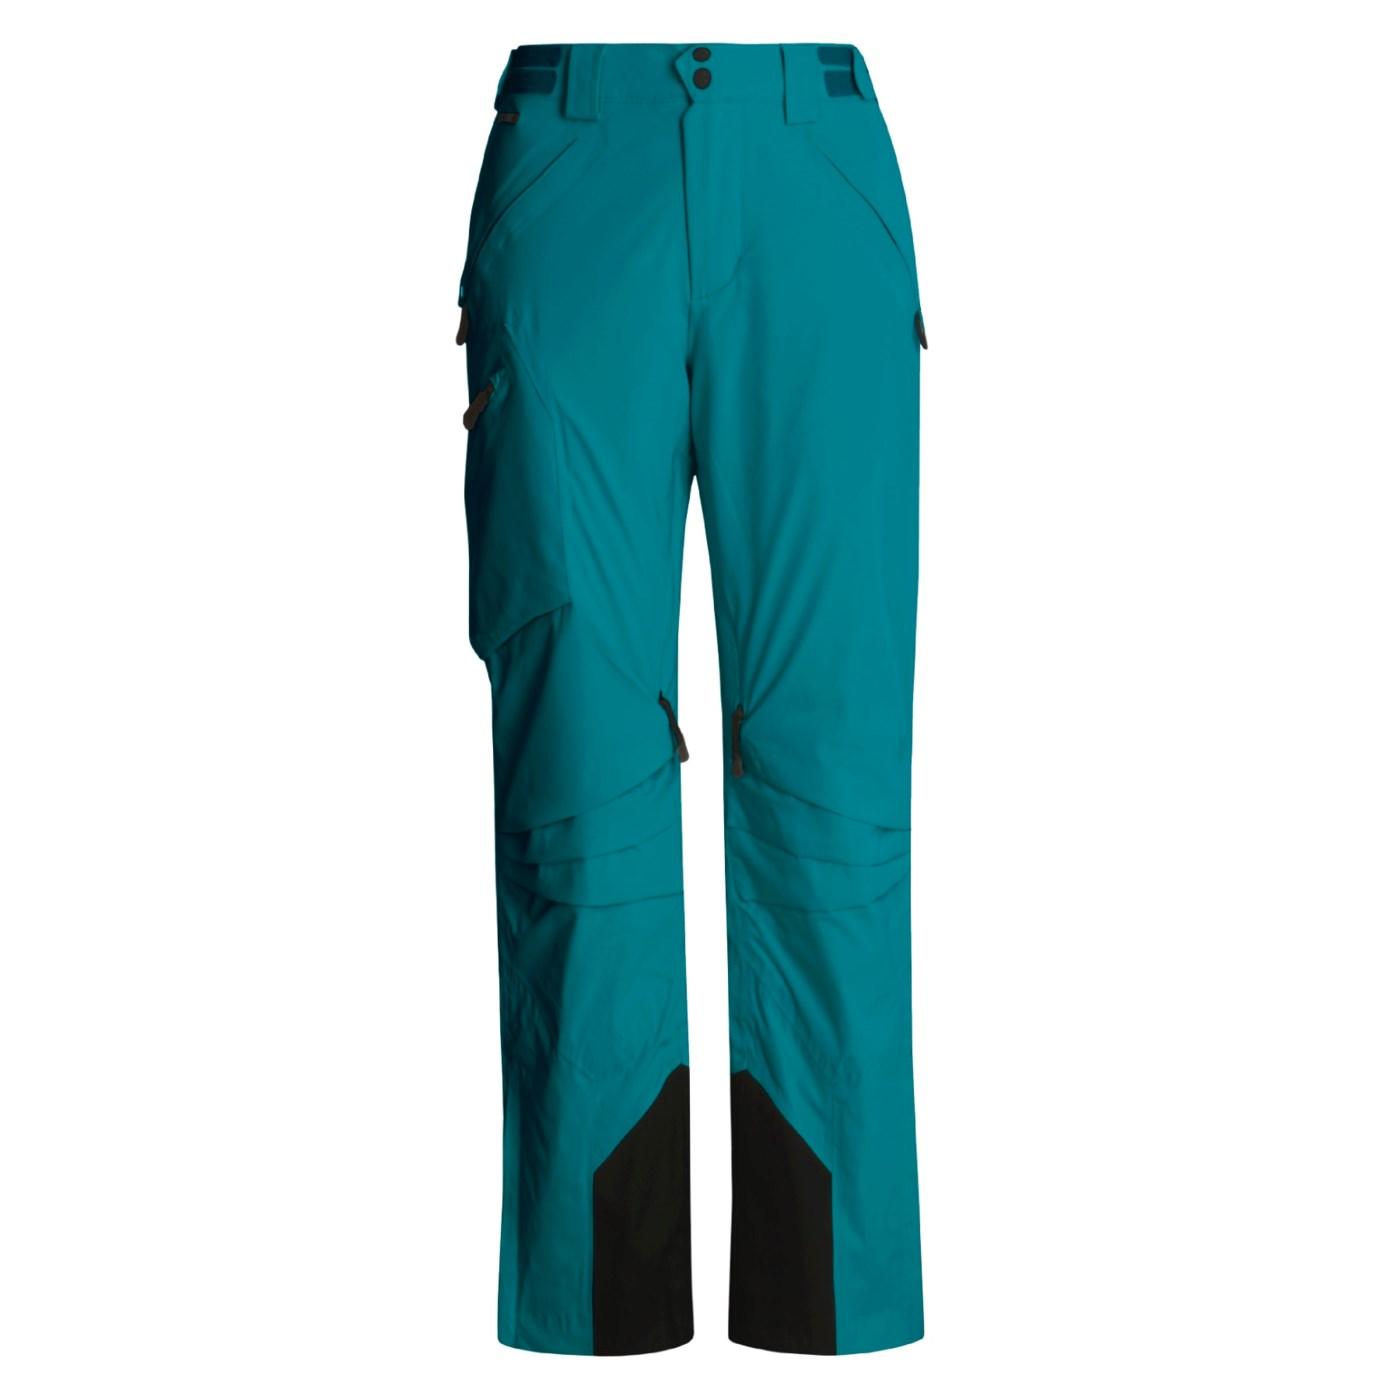 Spyder Chute Ski Pants Waterproof f34233ea6